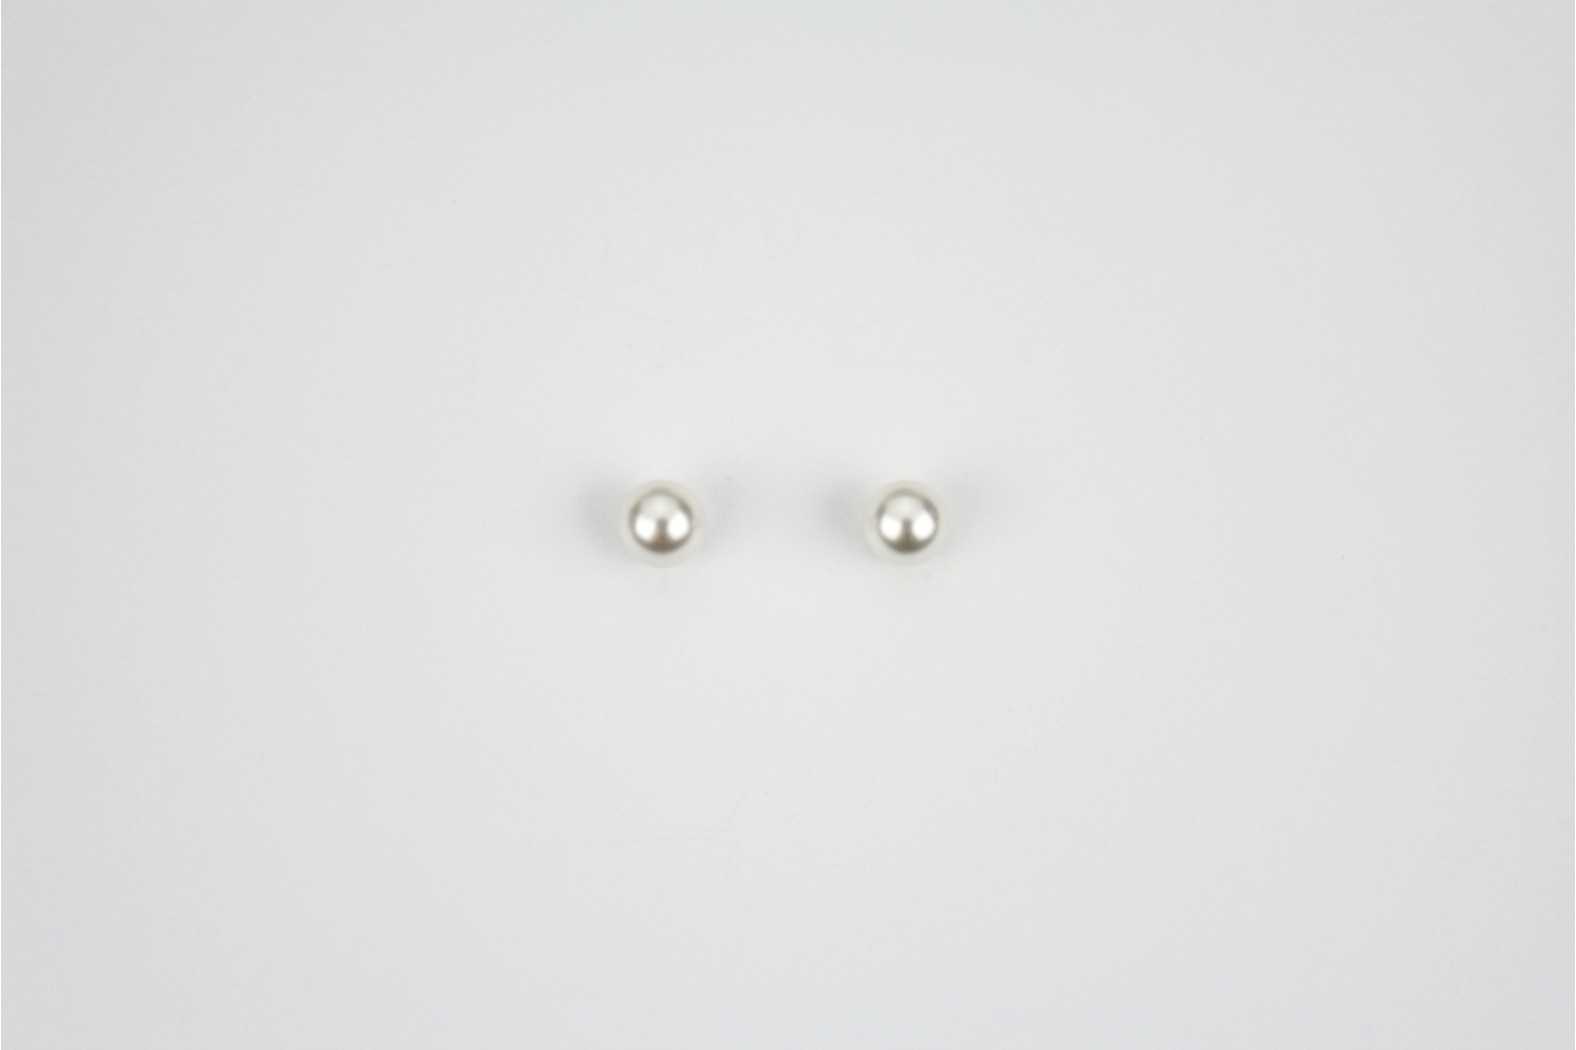 Circular silver colour small ball stud earrings